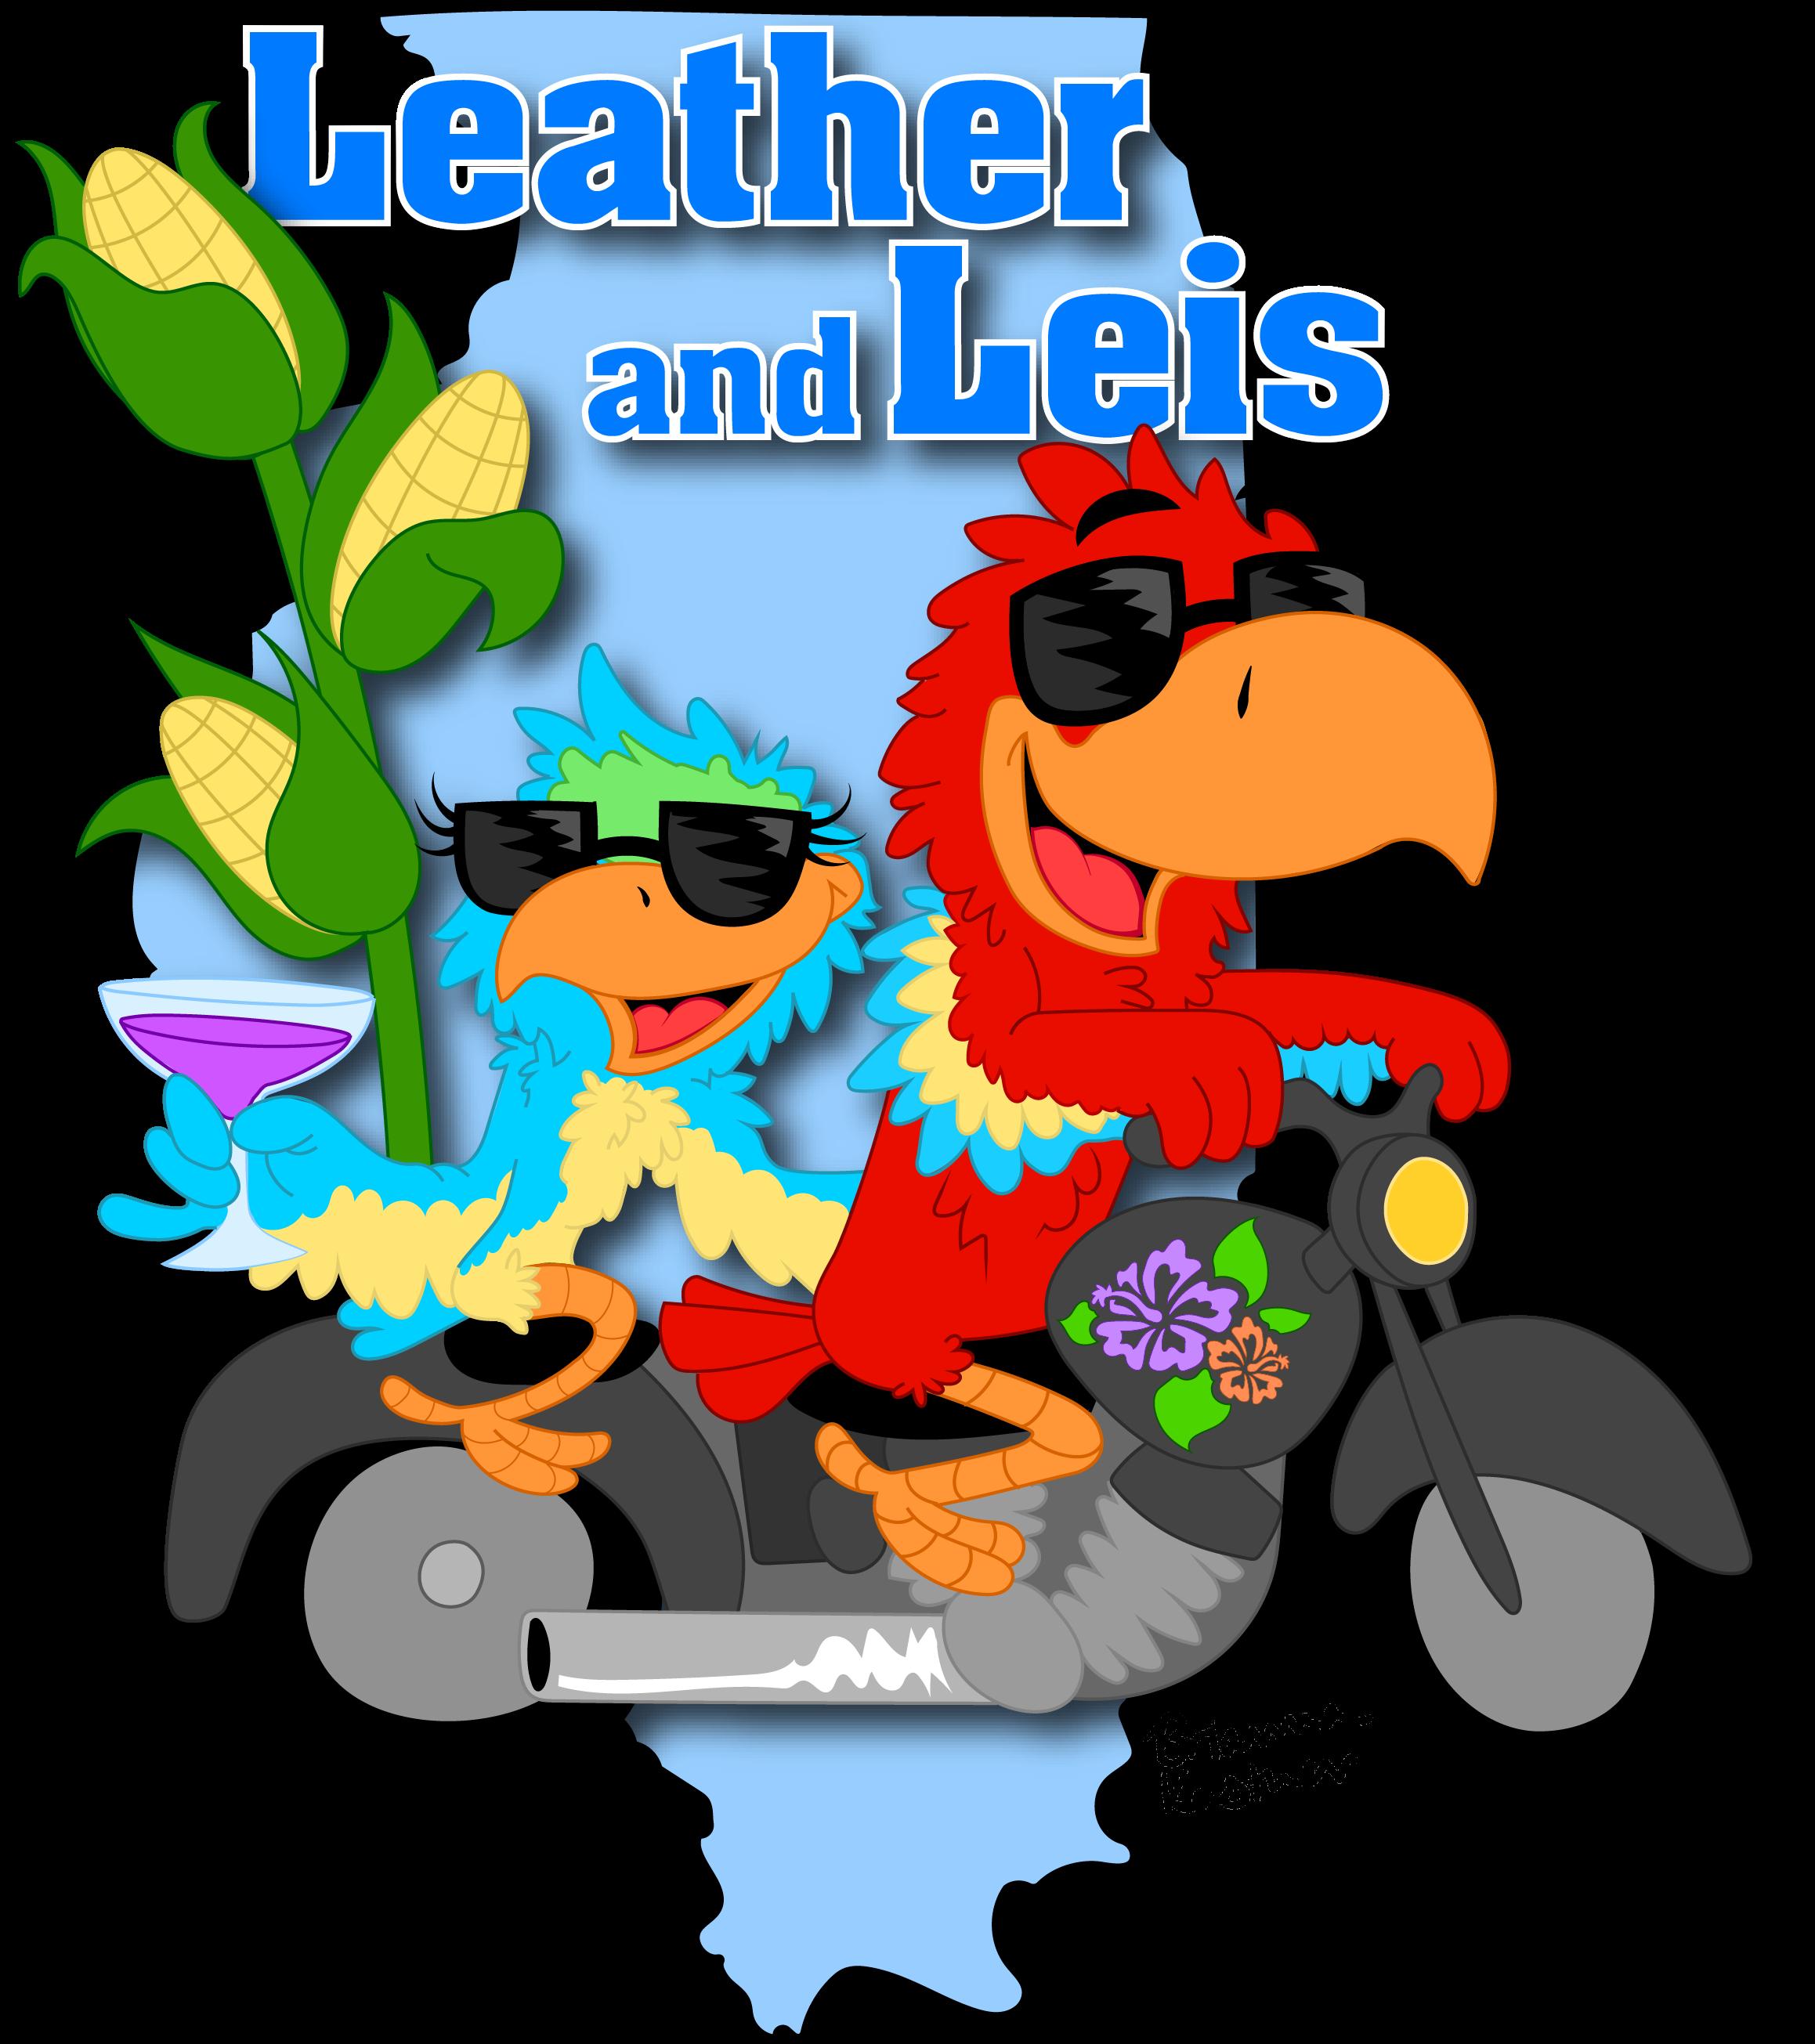 L&l Logo - L&l Hawaiian Barbecue (2346x2632)